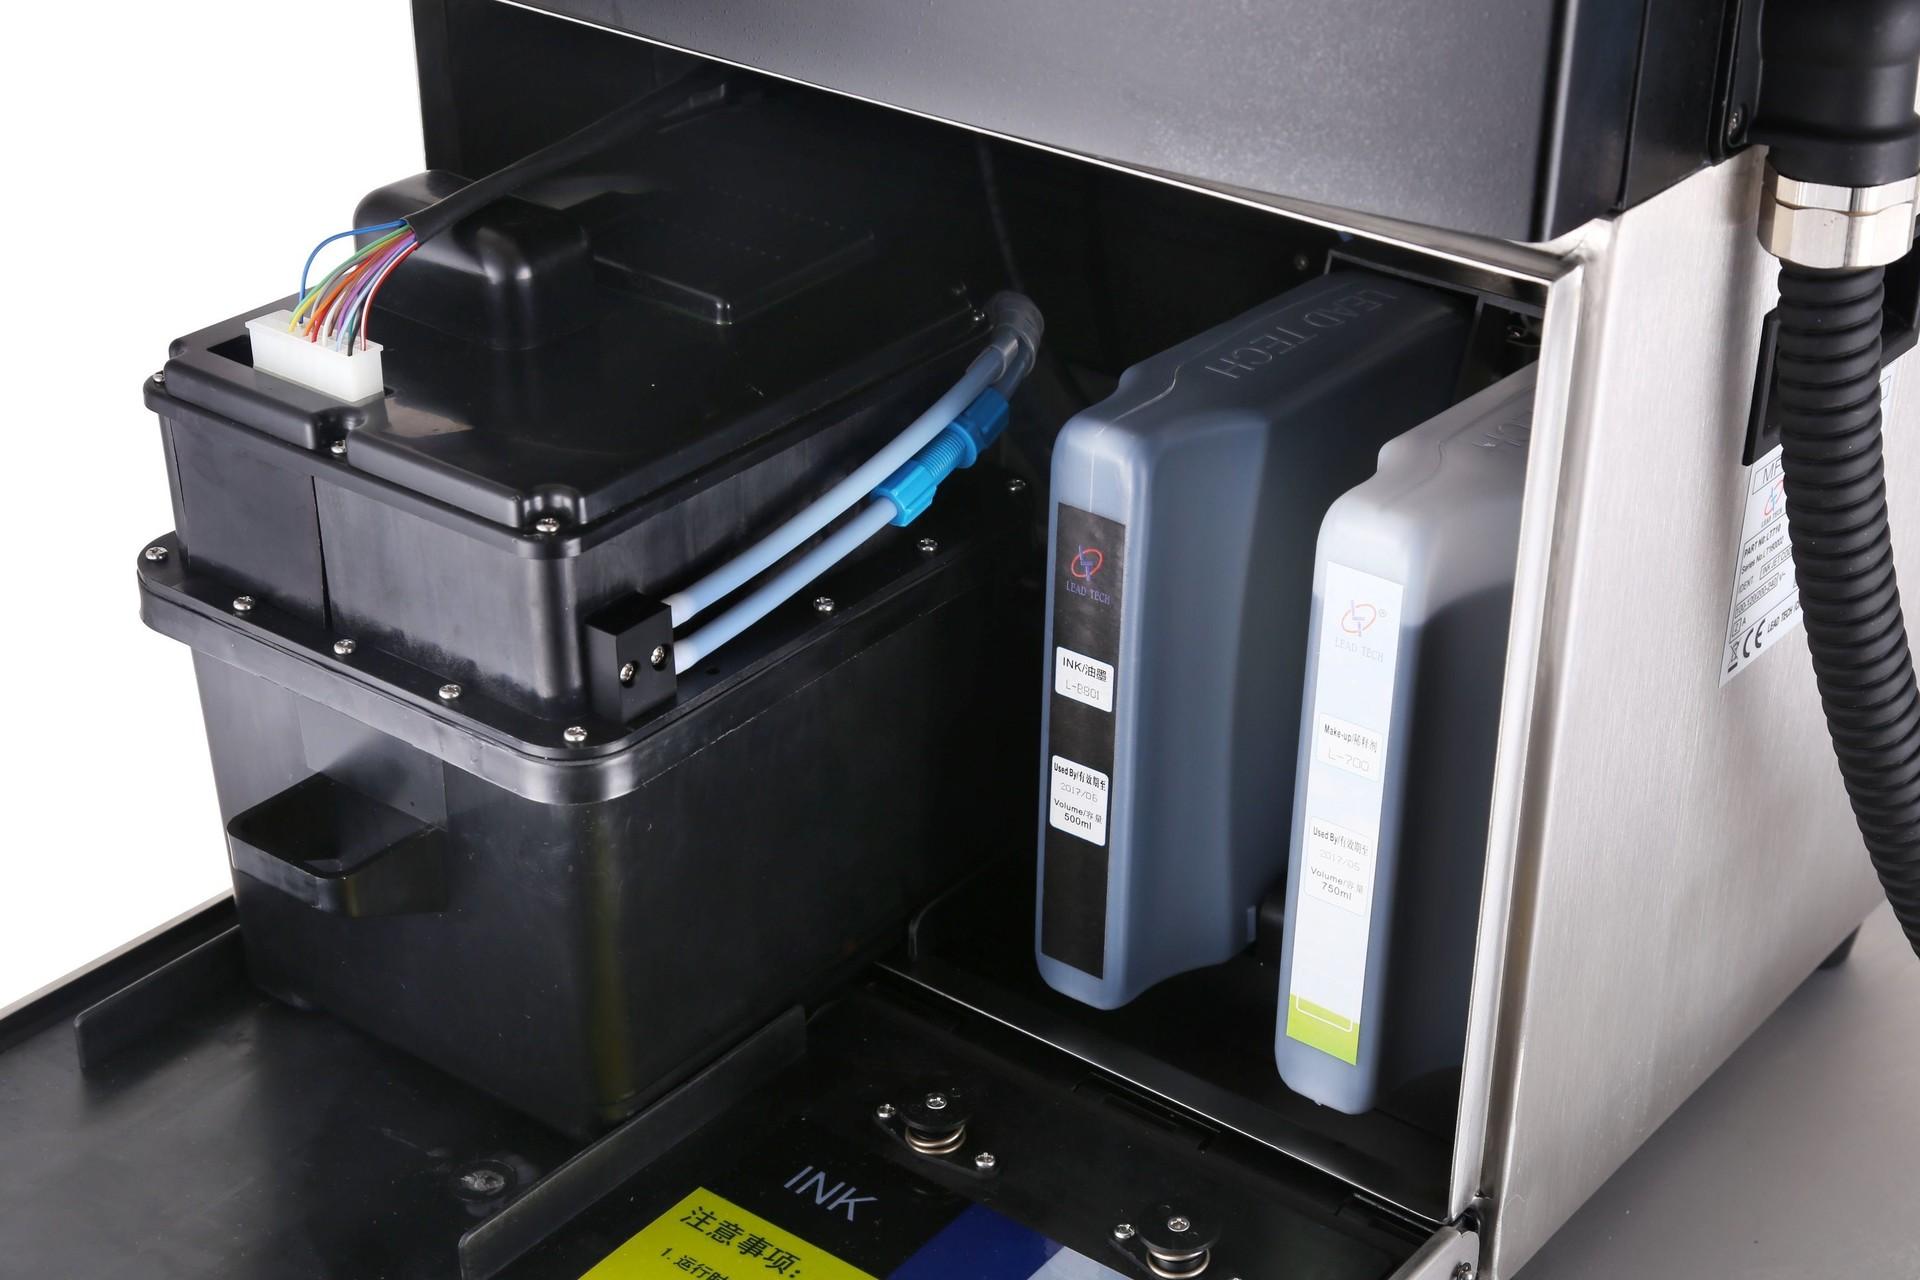 Lead Tech Lt760 Continuous Plastic film Coding Inkjet Printer